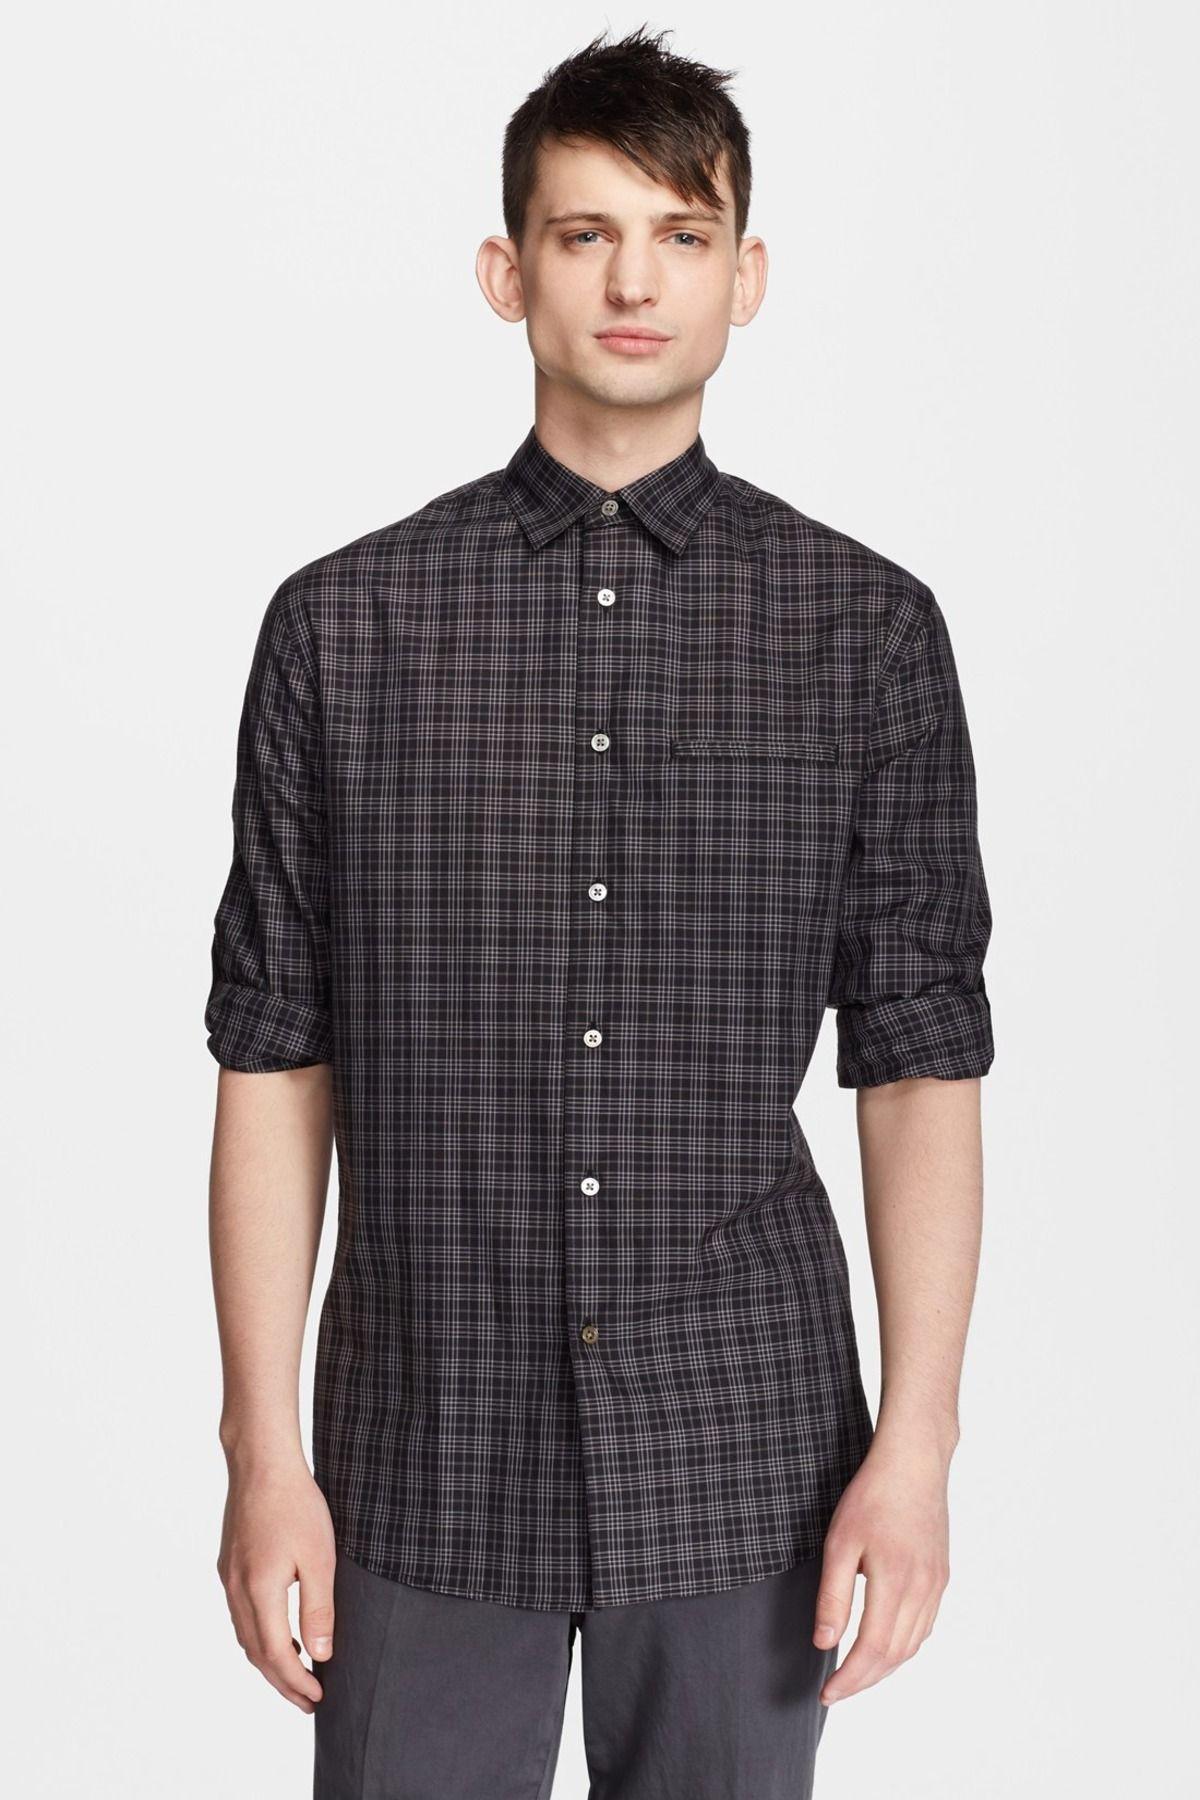 Plaid Slim Fit Shirt by John Varvatos Collection on @nordstrom_rack 54-64% Off